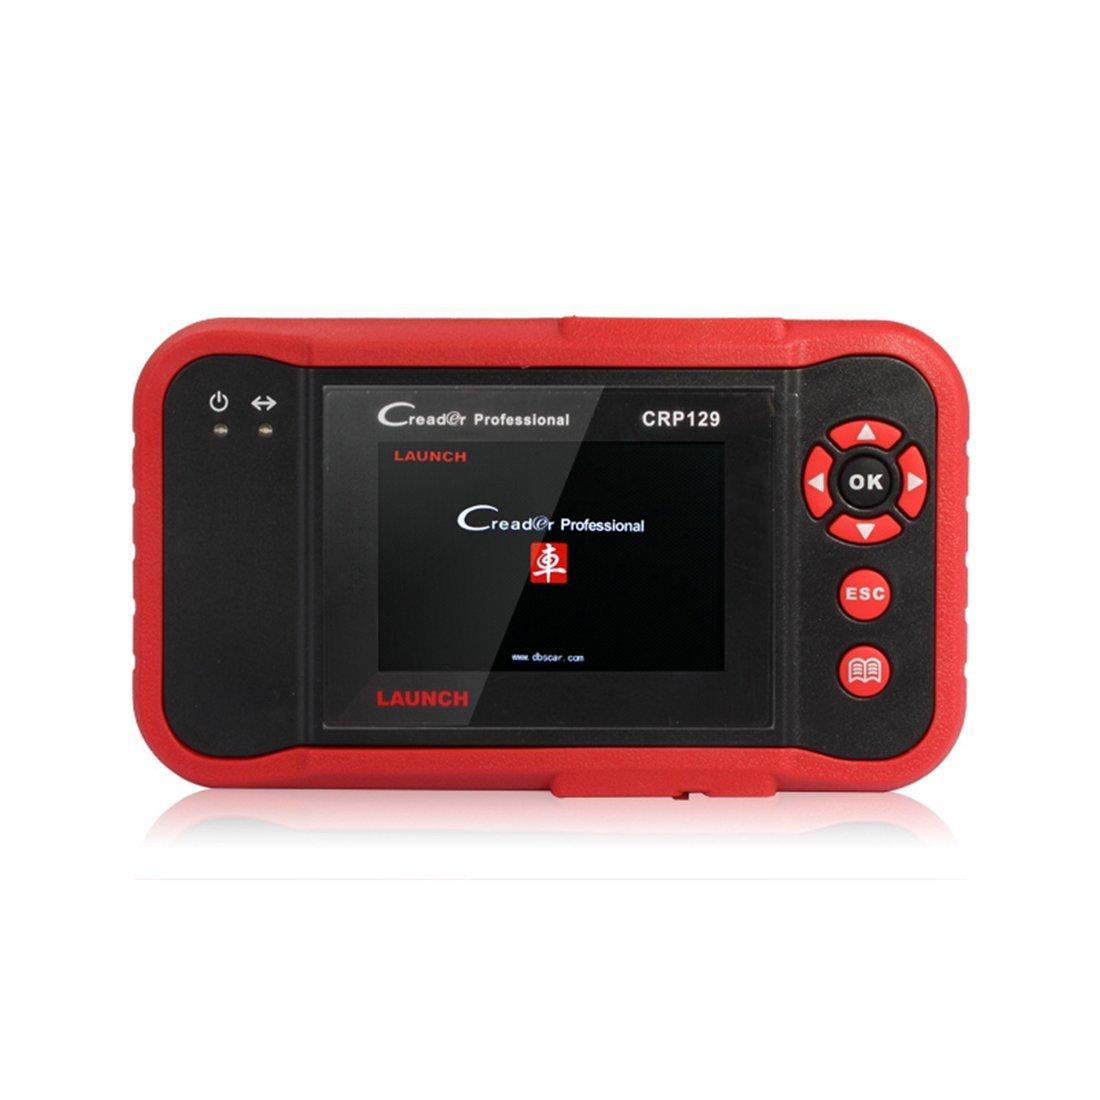 Launch CRP129 EOBD ENG/AT/ABS/SRS EPB SAS Oil Service Light resets obd2 Diagnostic Scanner Auto Code Reader